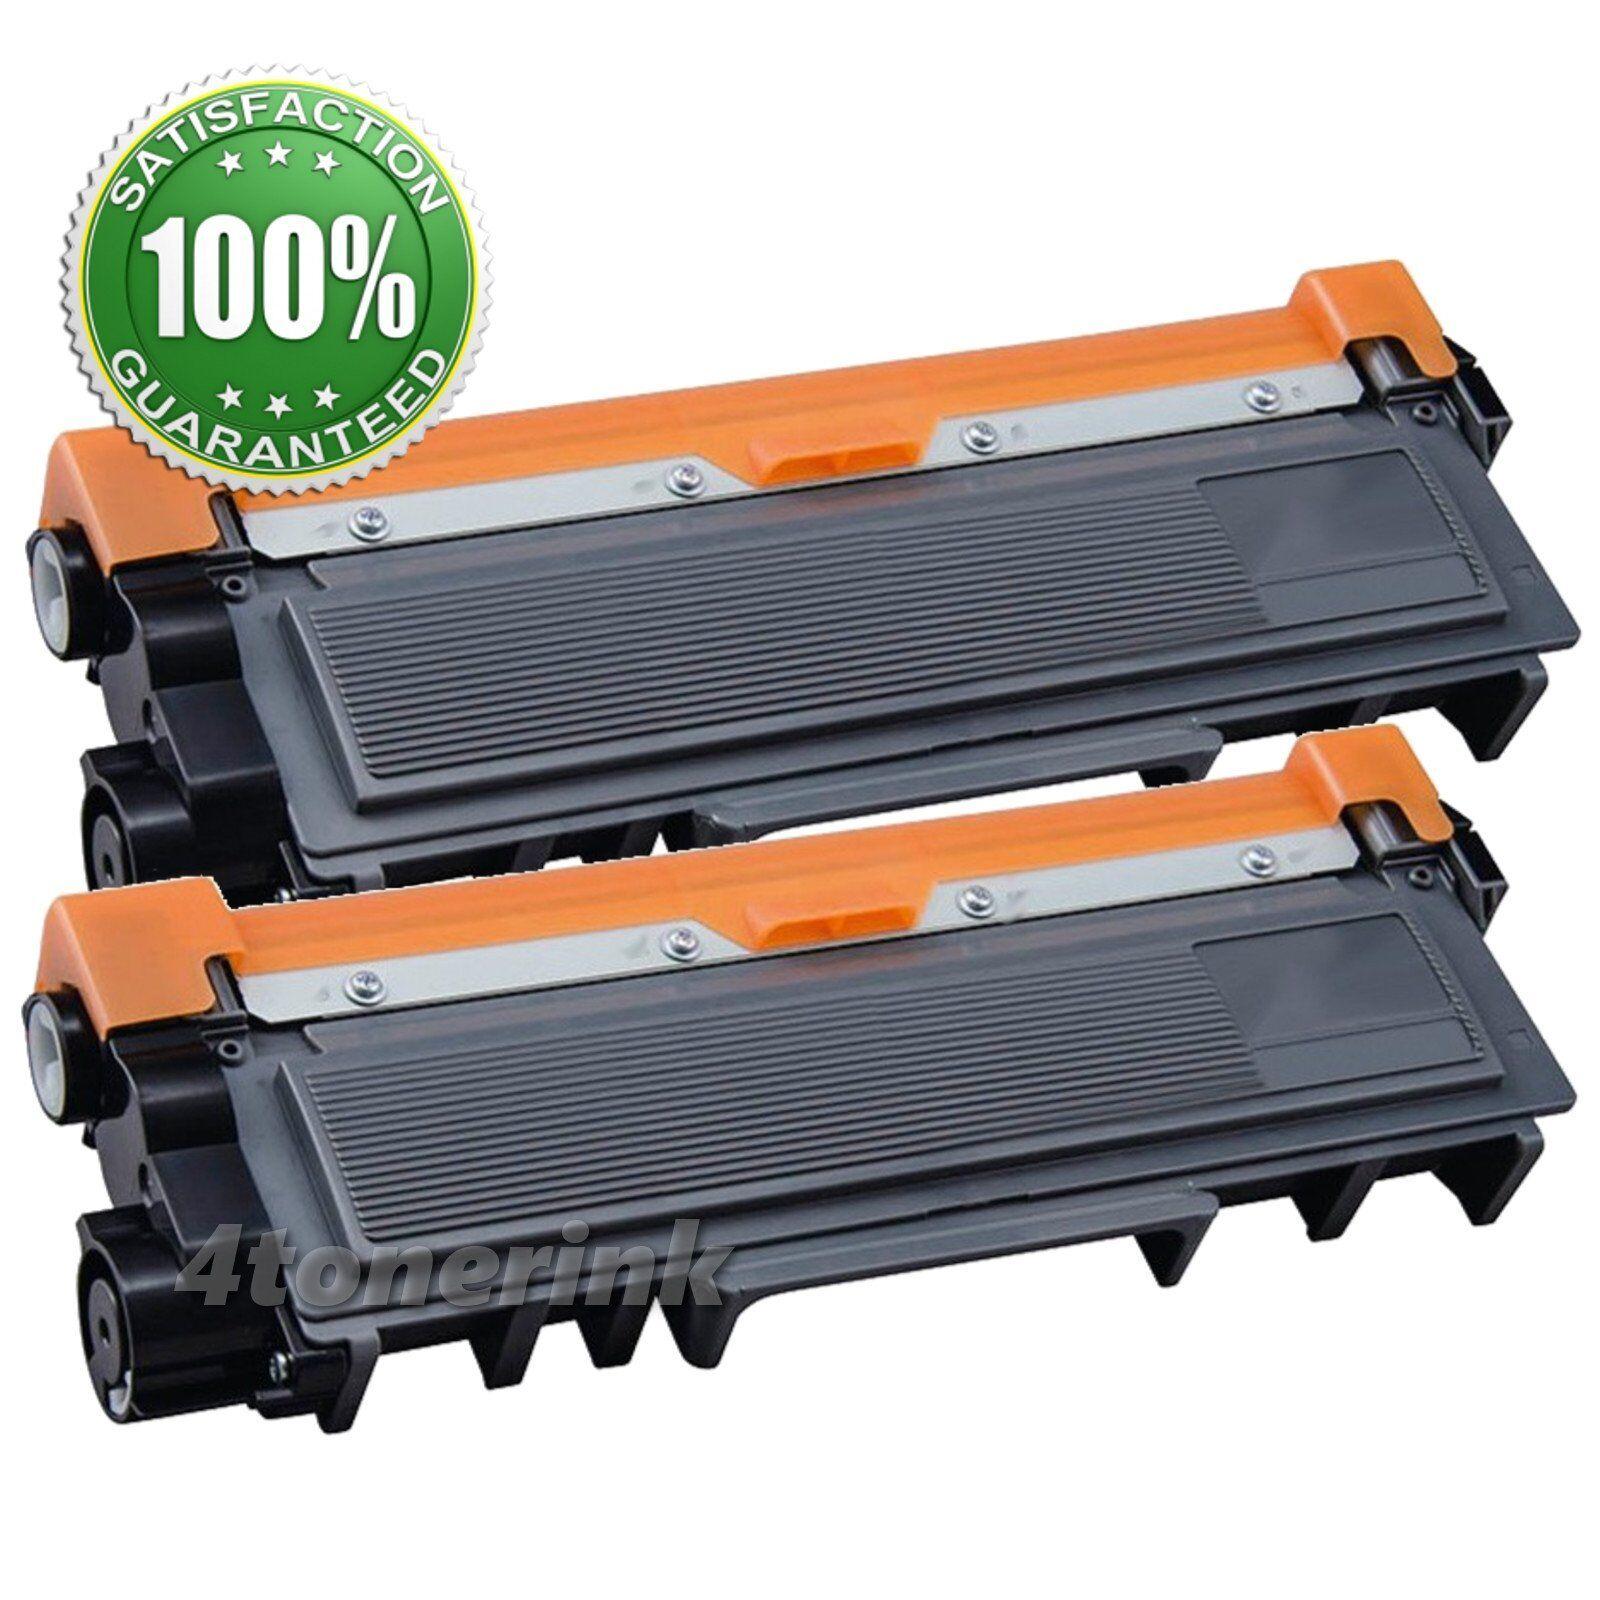 2PK TN660 Toner for Brother TN630 HL-L2340DW L2320D L2300D